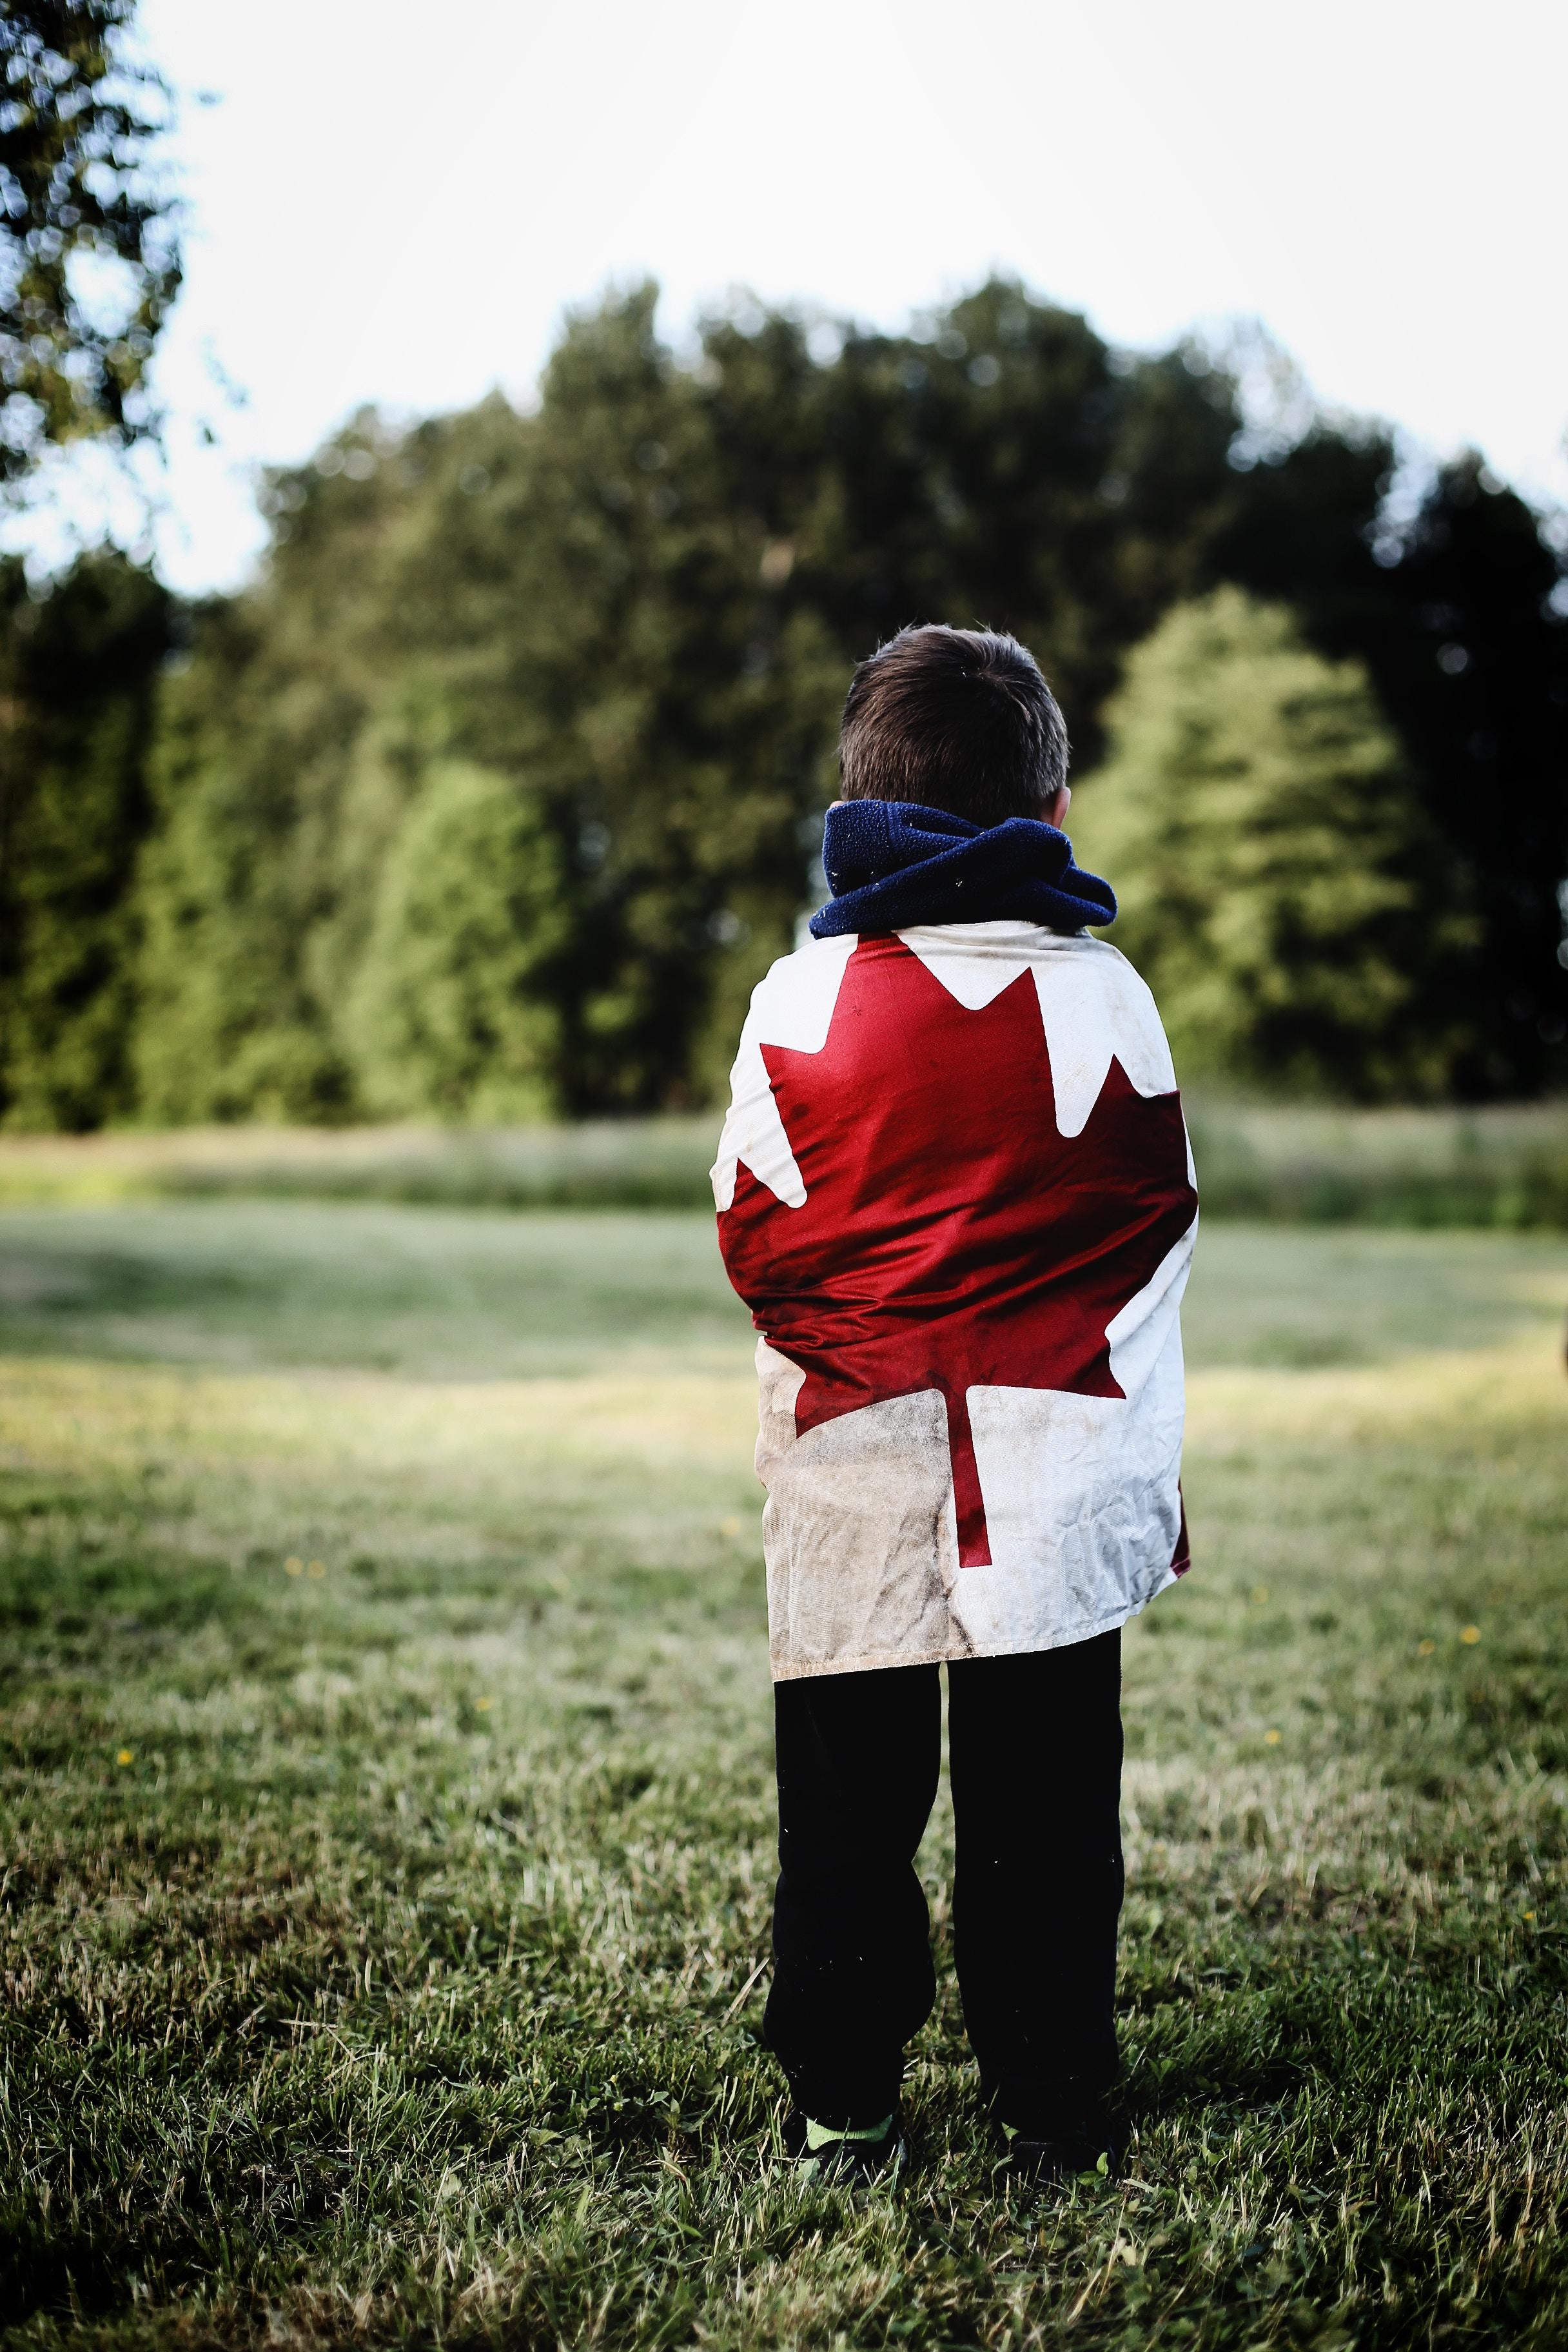 FedDev Ontario – Community Economic Development & Diversification Funding –  starting at $250,000